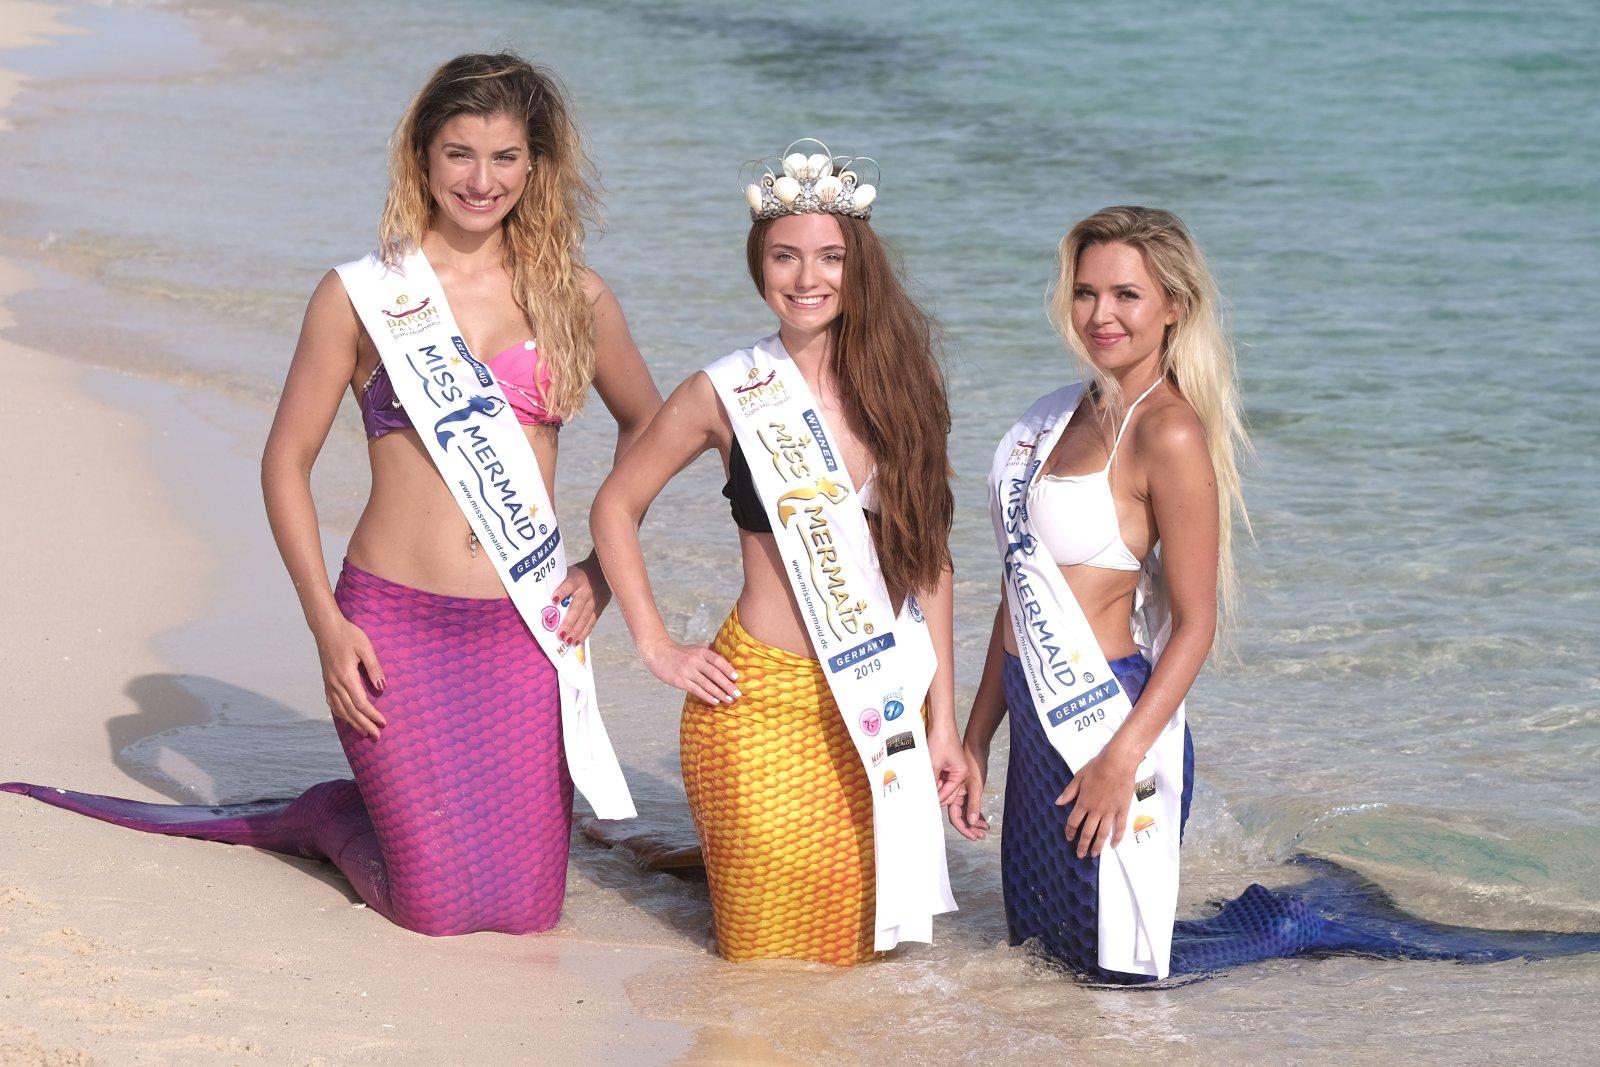 Miss Mermaid International 2019 Winner Yanella Elledy Peru. Left 1st runner-up Jacyielle Furtado, Brazil. 2nd runner-up - Adrienne Wilson, Hawaii